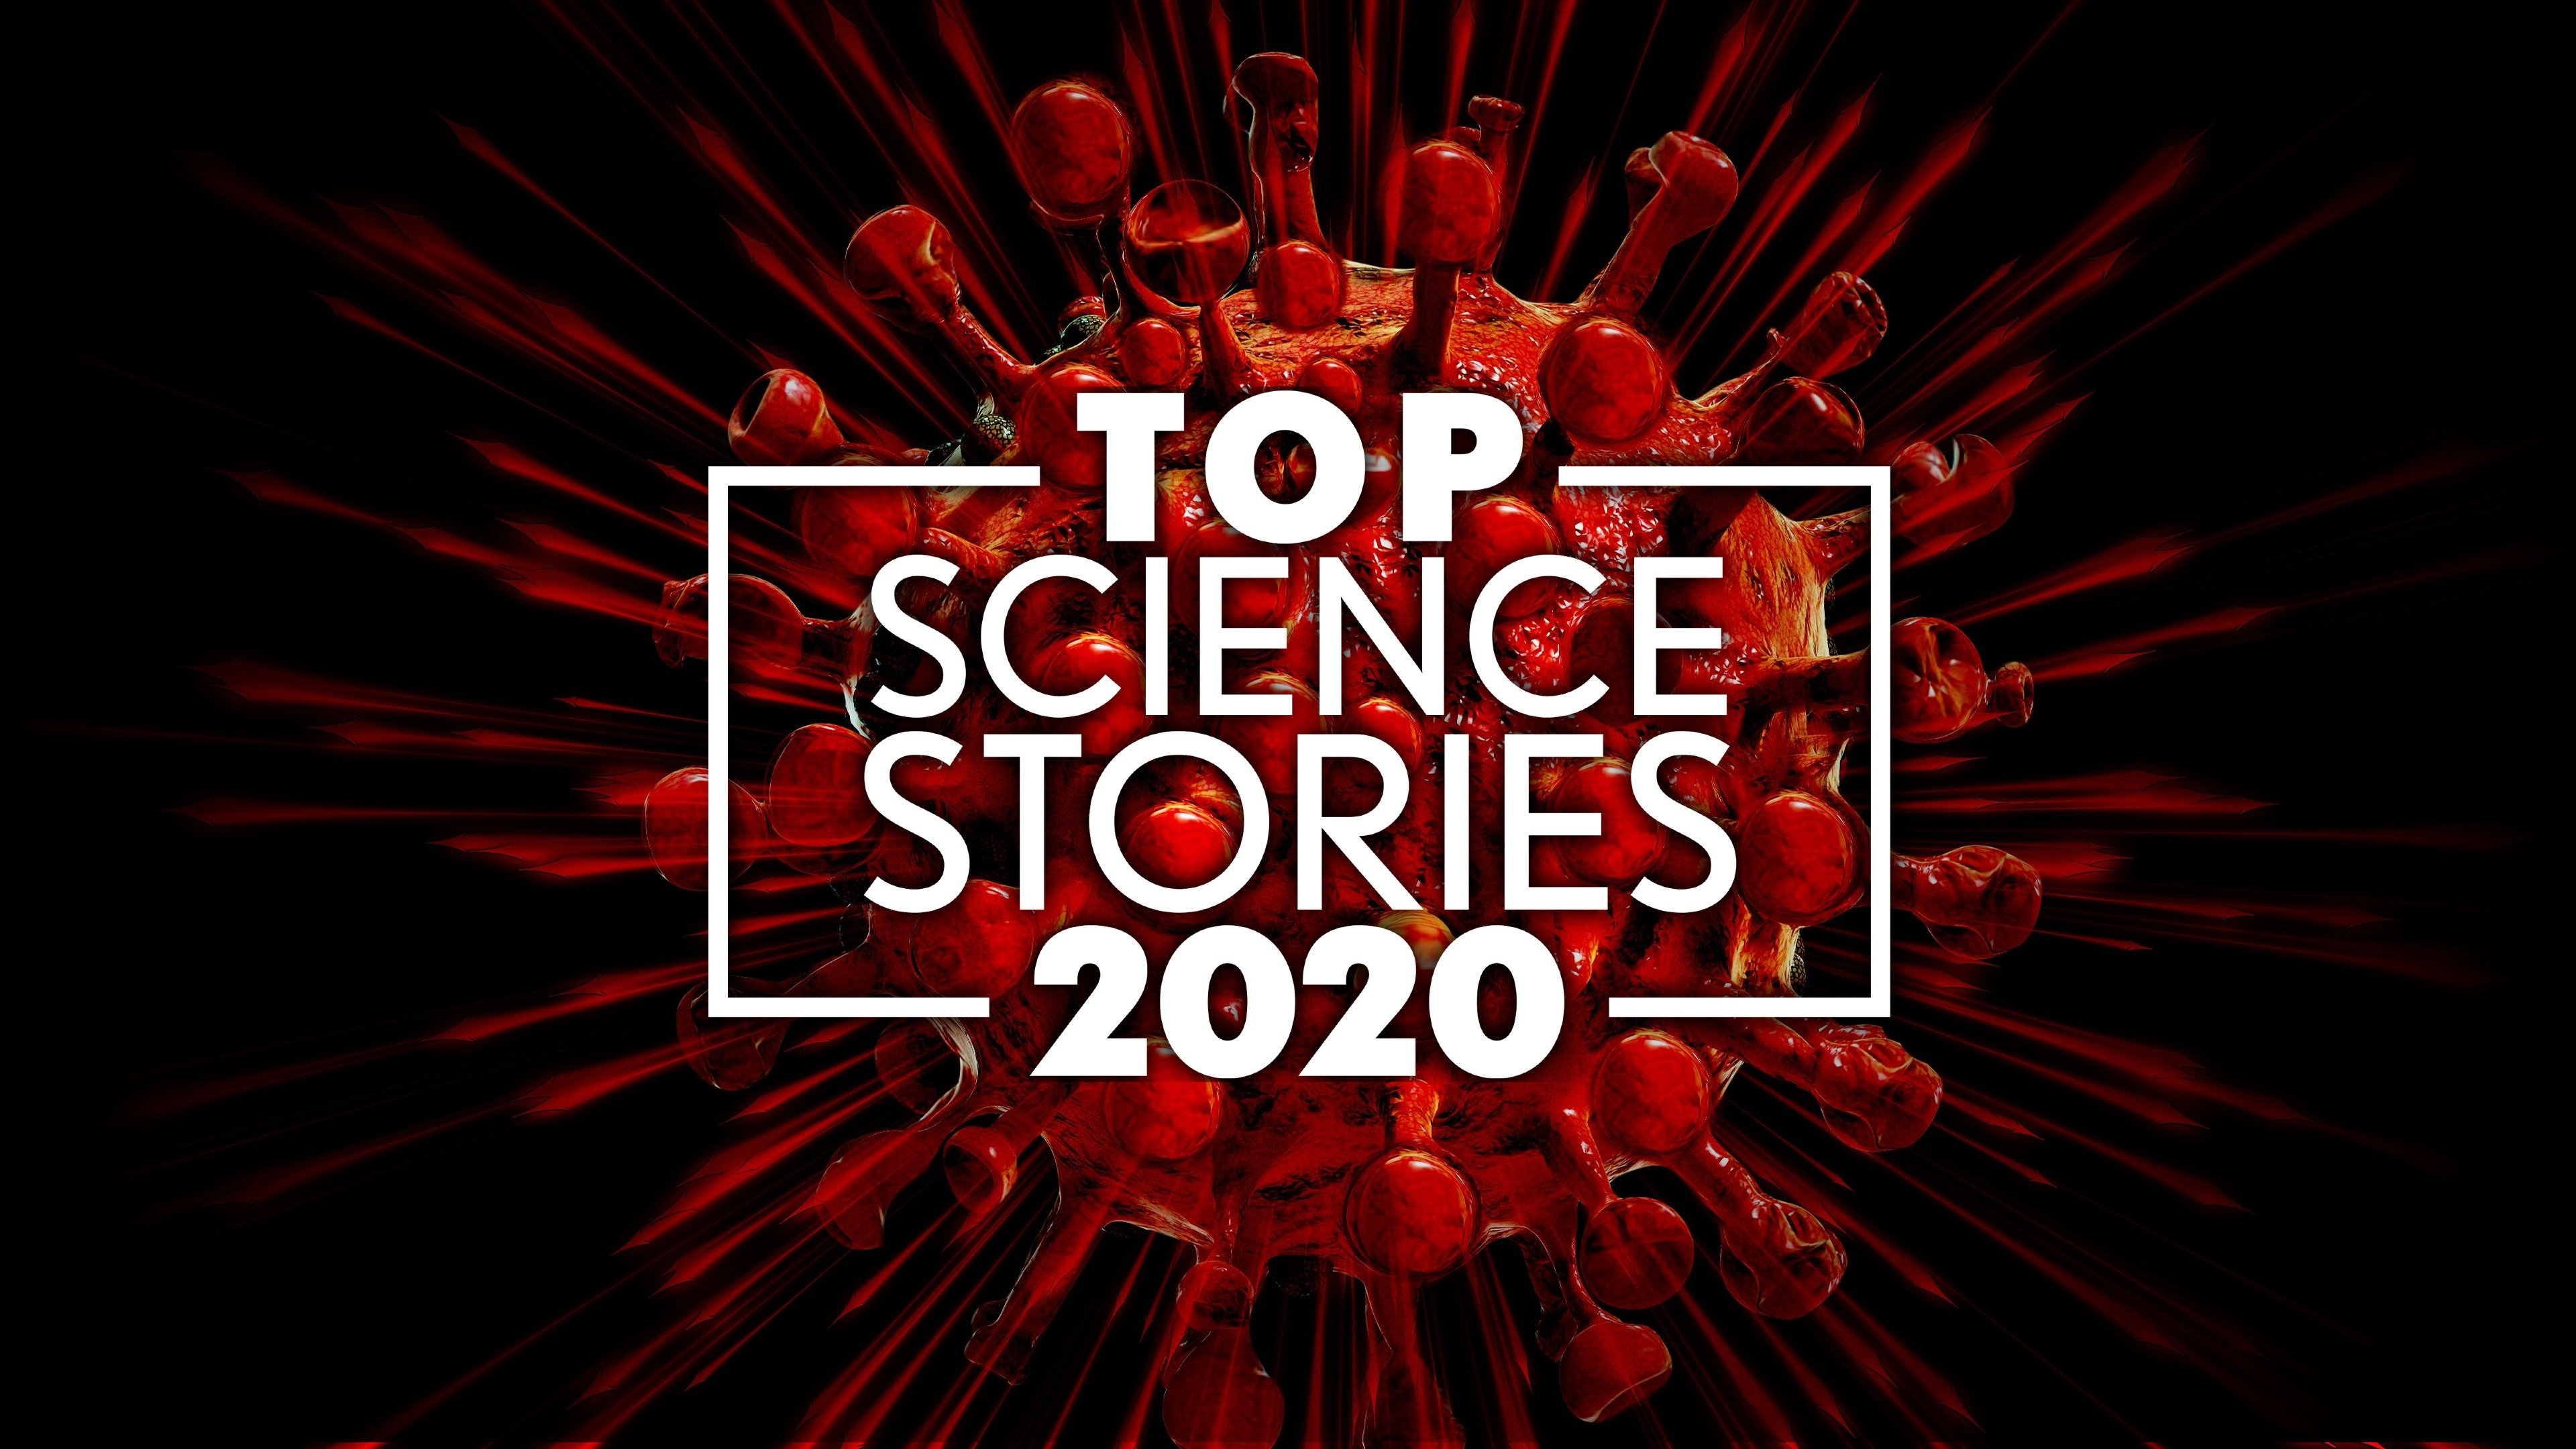 Top Science Stories of 2020